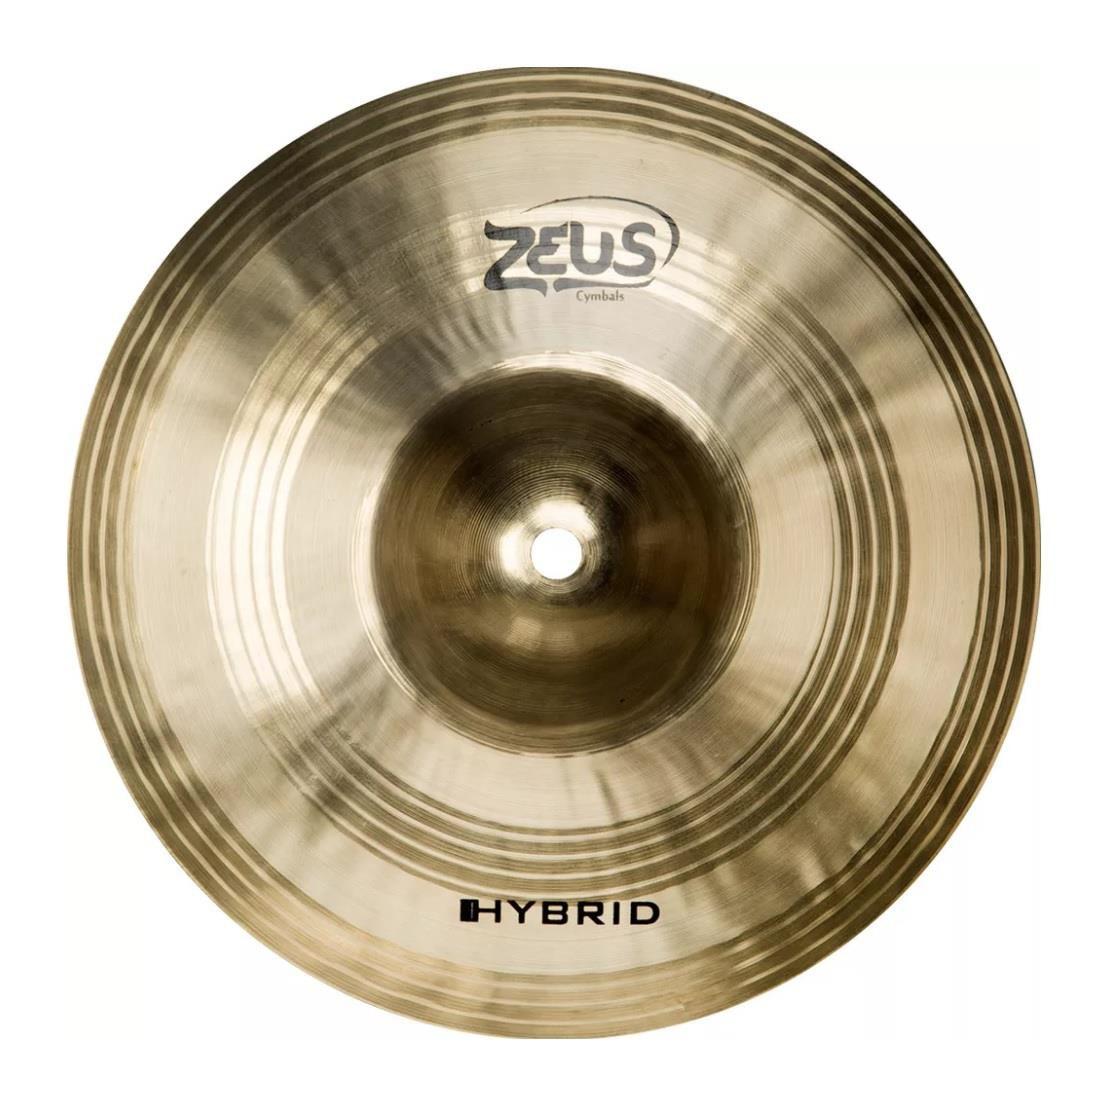 Prato de Ataque Zeus Cymbals Hybrid ZHC16 16